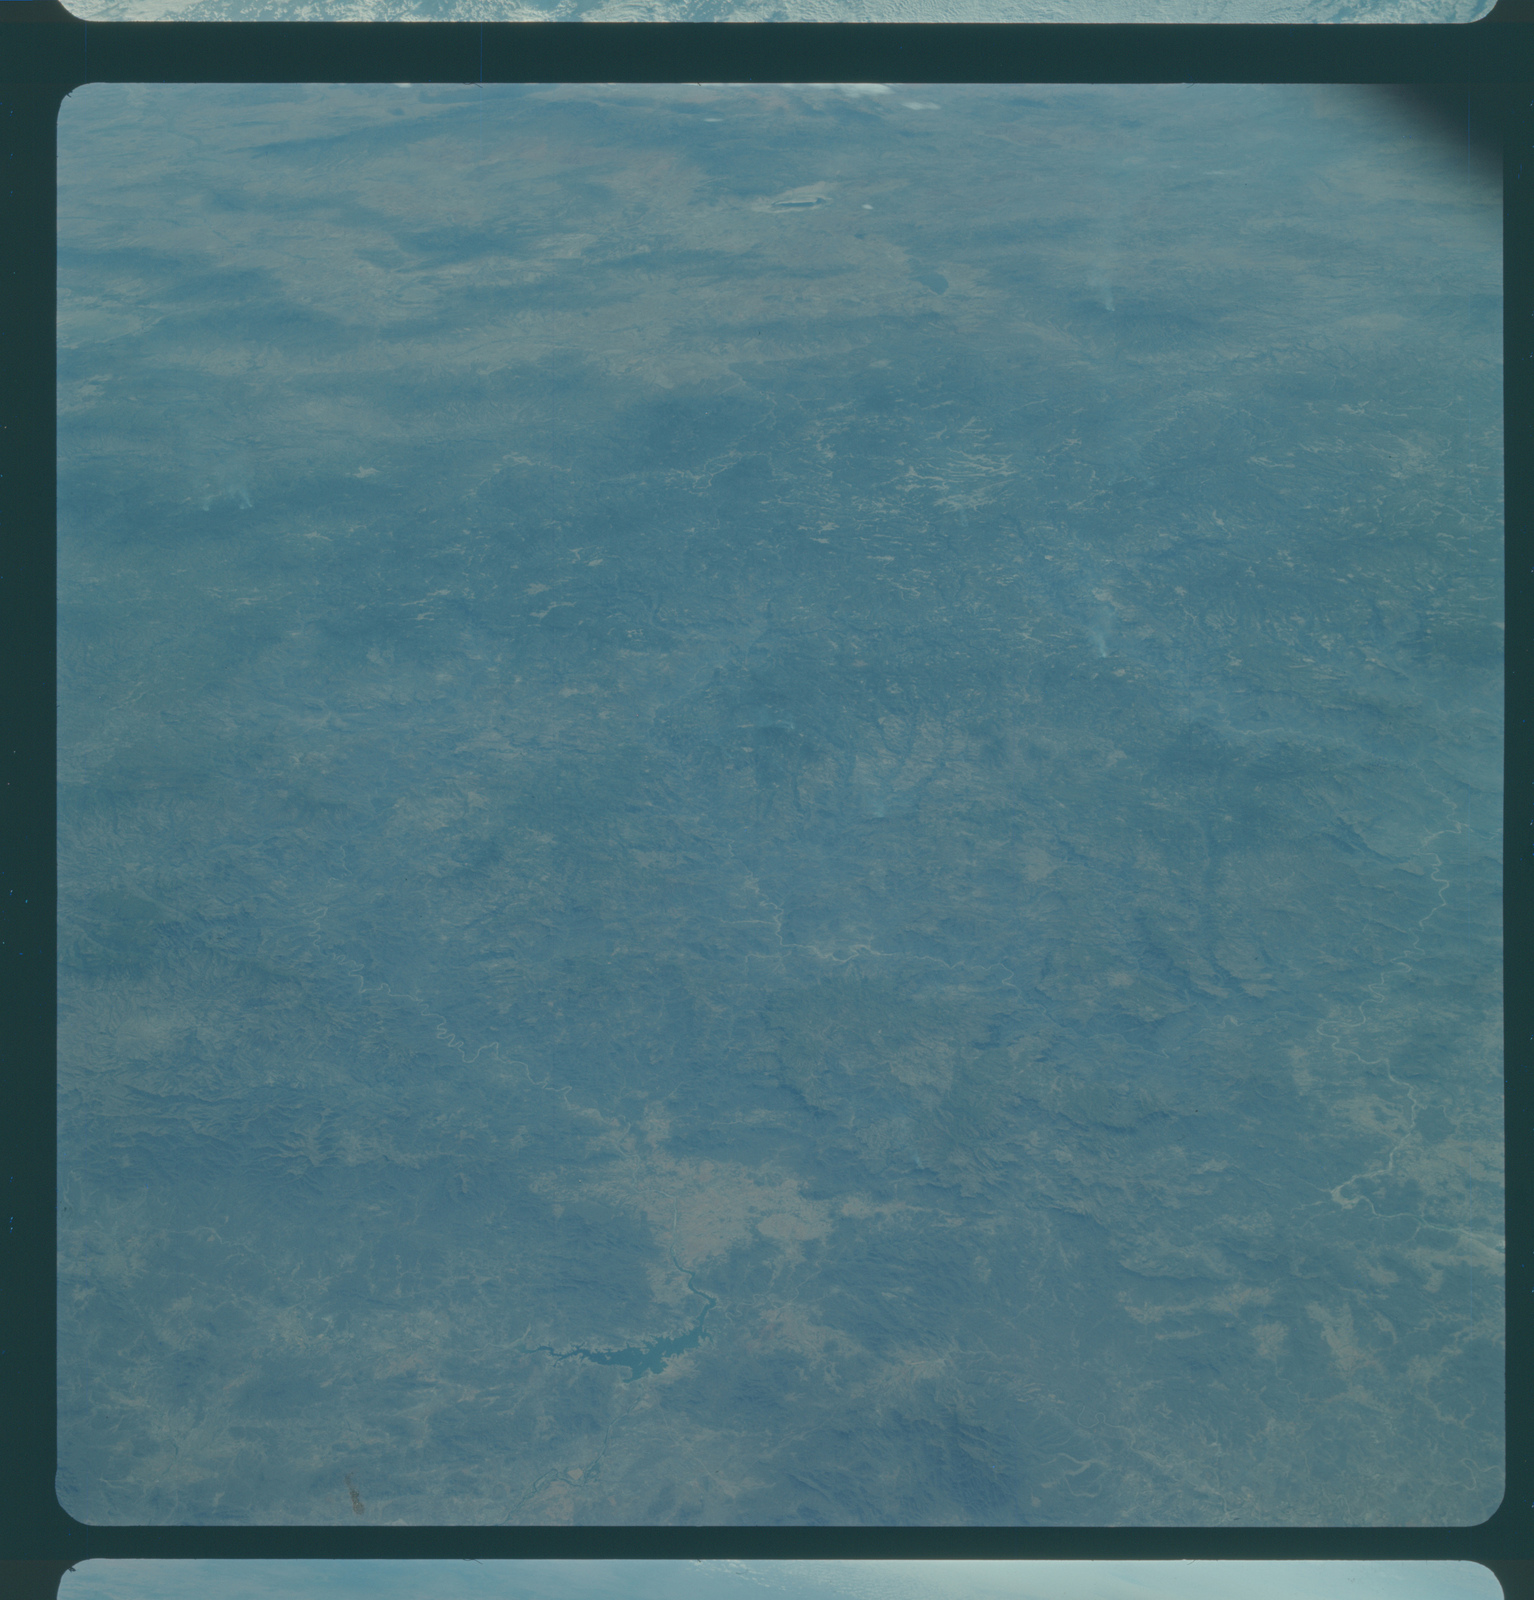 Gemini IV Mission Image - Mexico